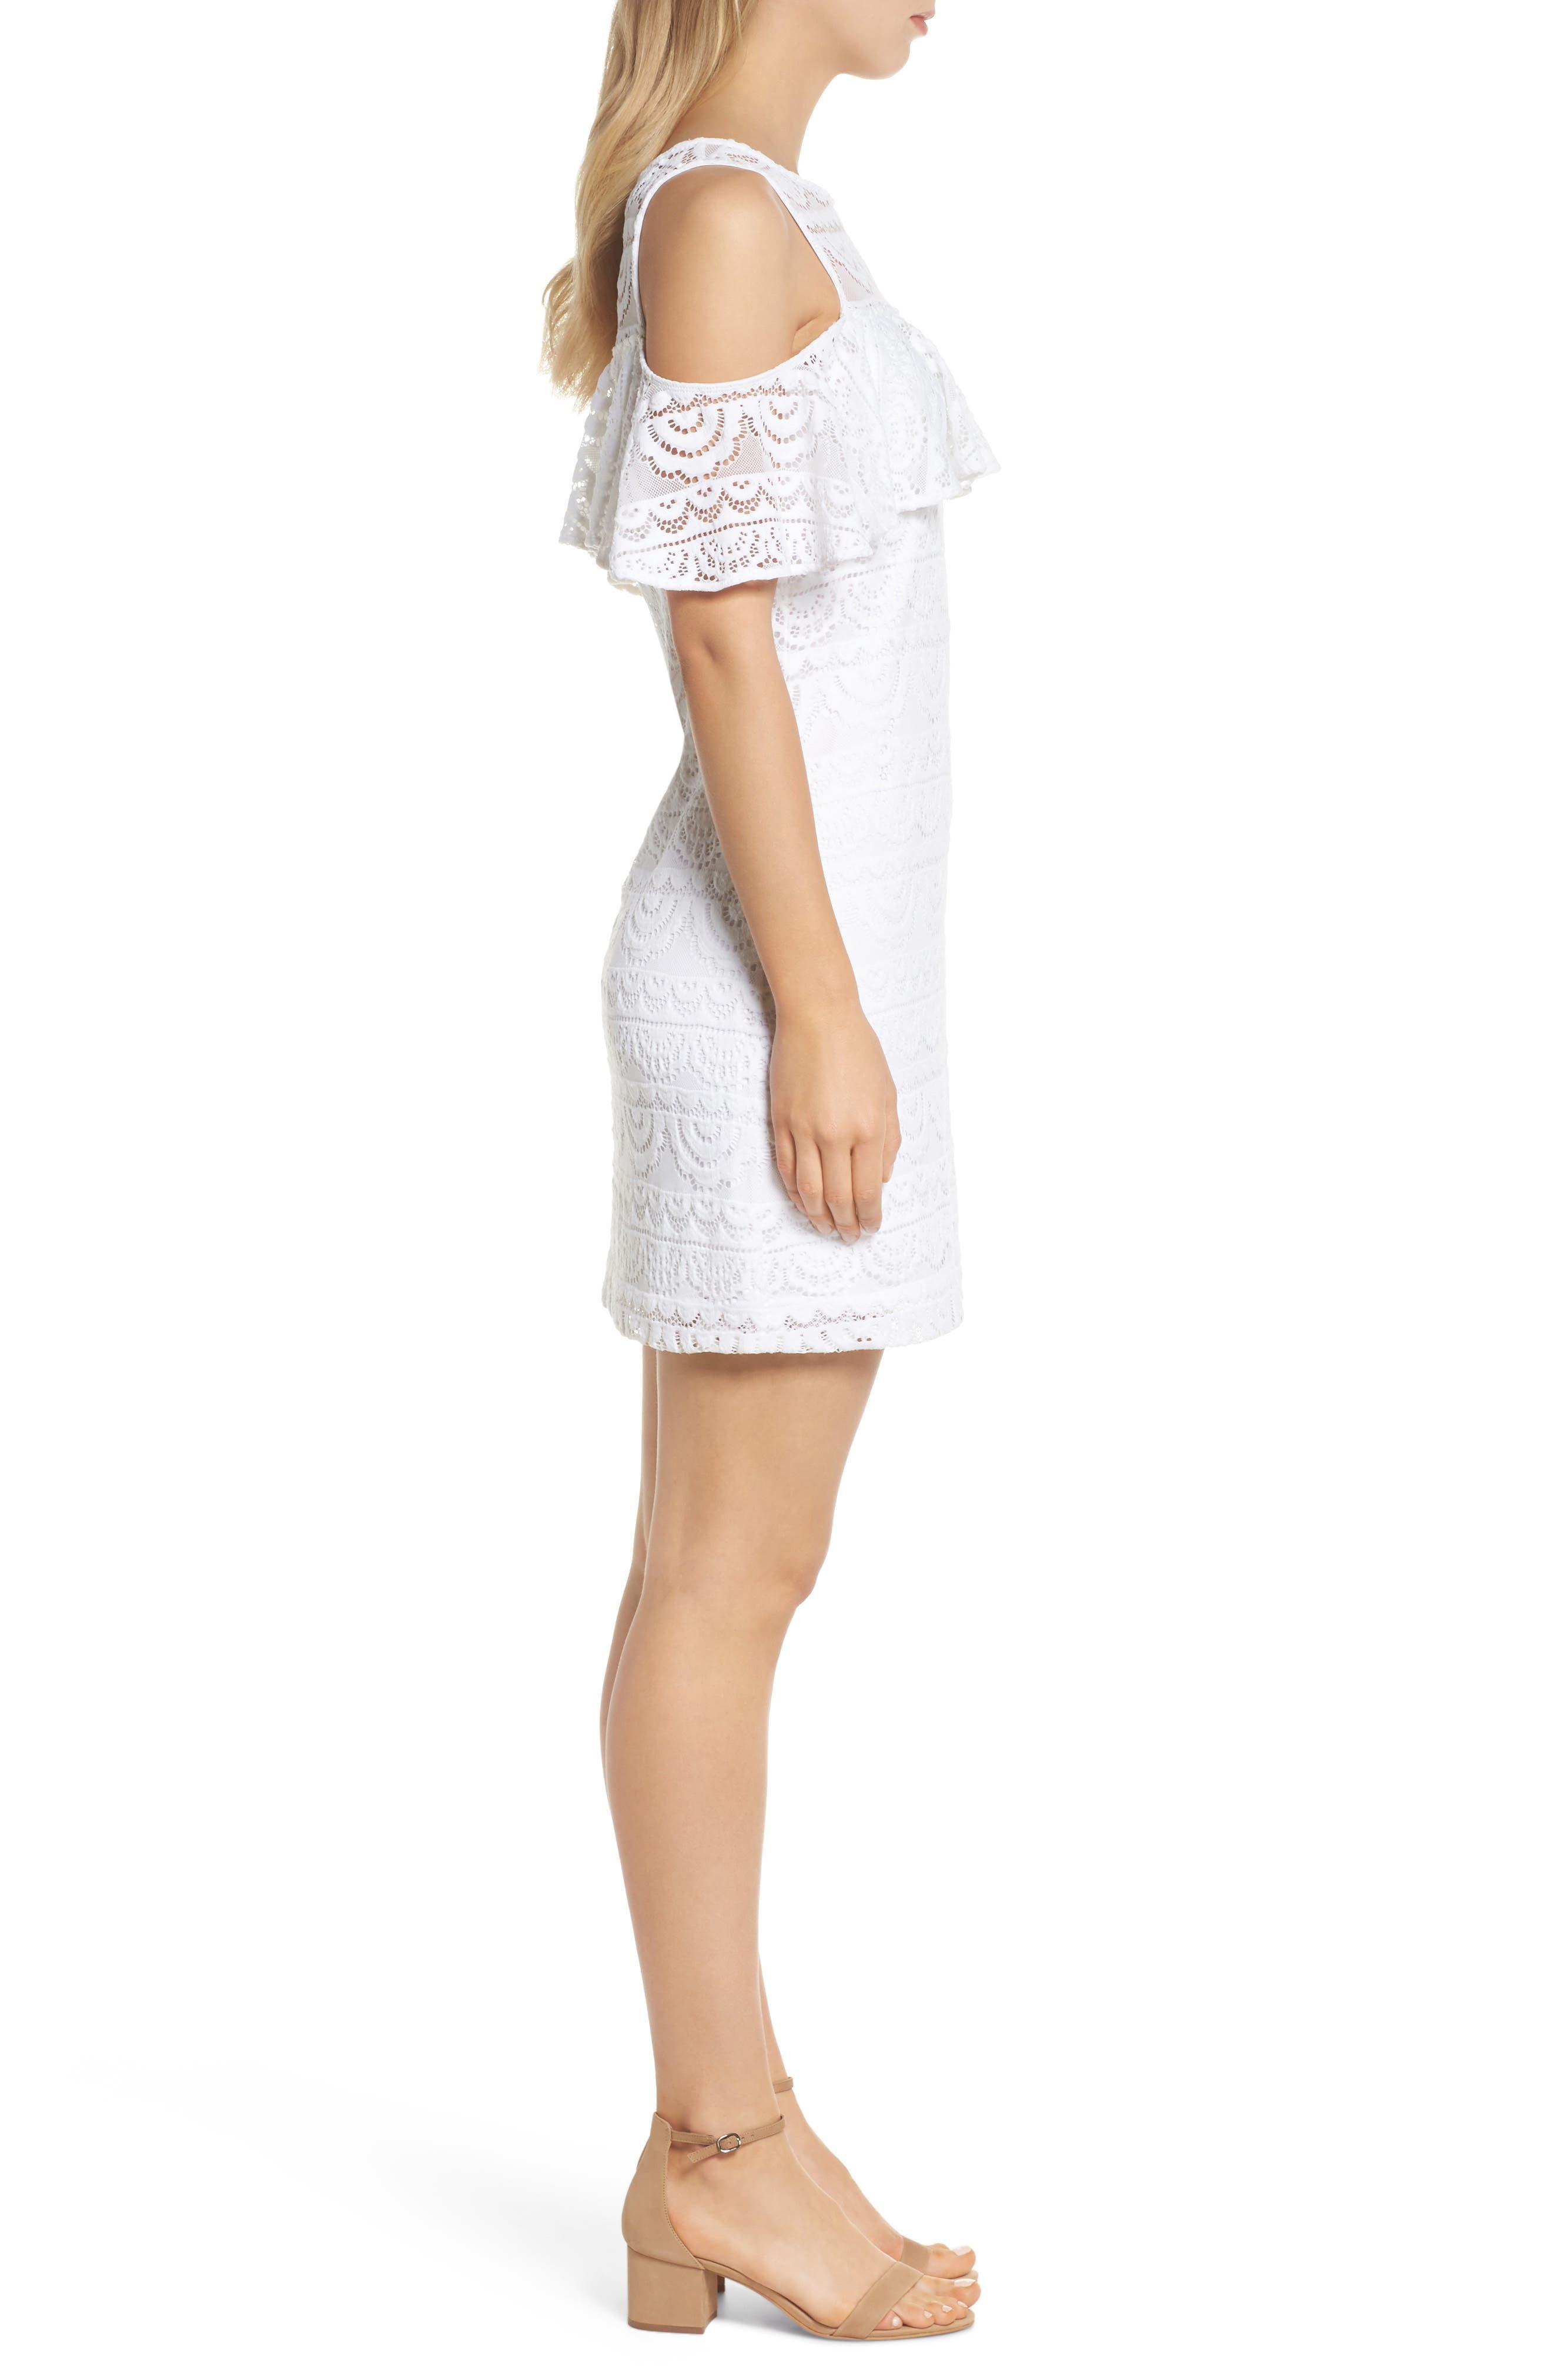 Lyra Cold Shoulder Lace Dress,                             Alternate thumbnail 3, color,                             RESORT WHITE SCALLOP LACE